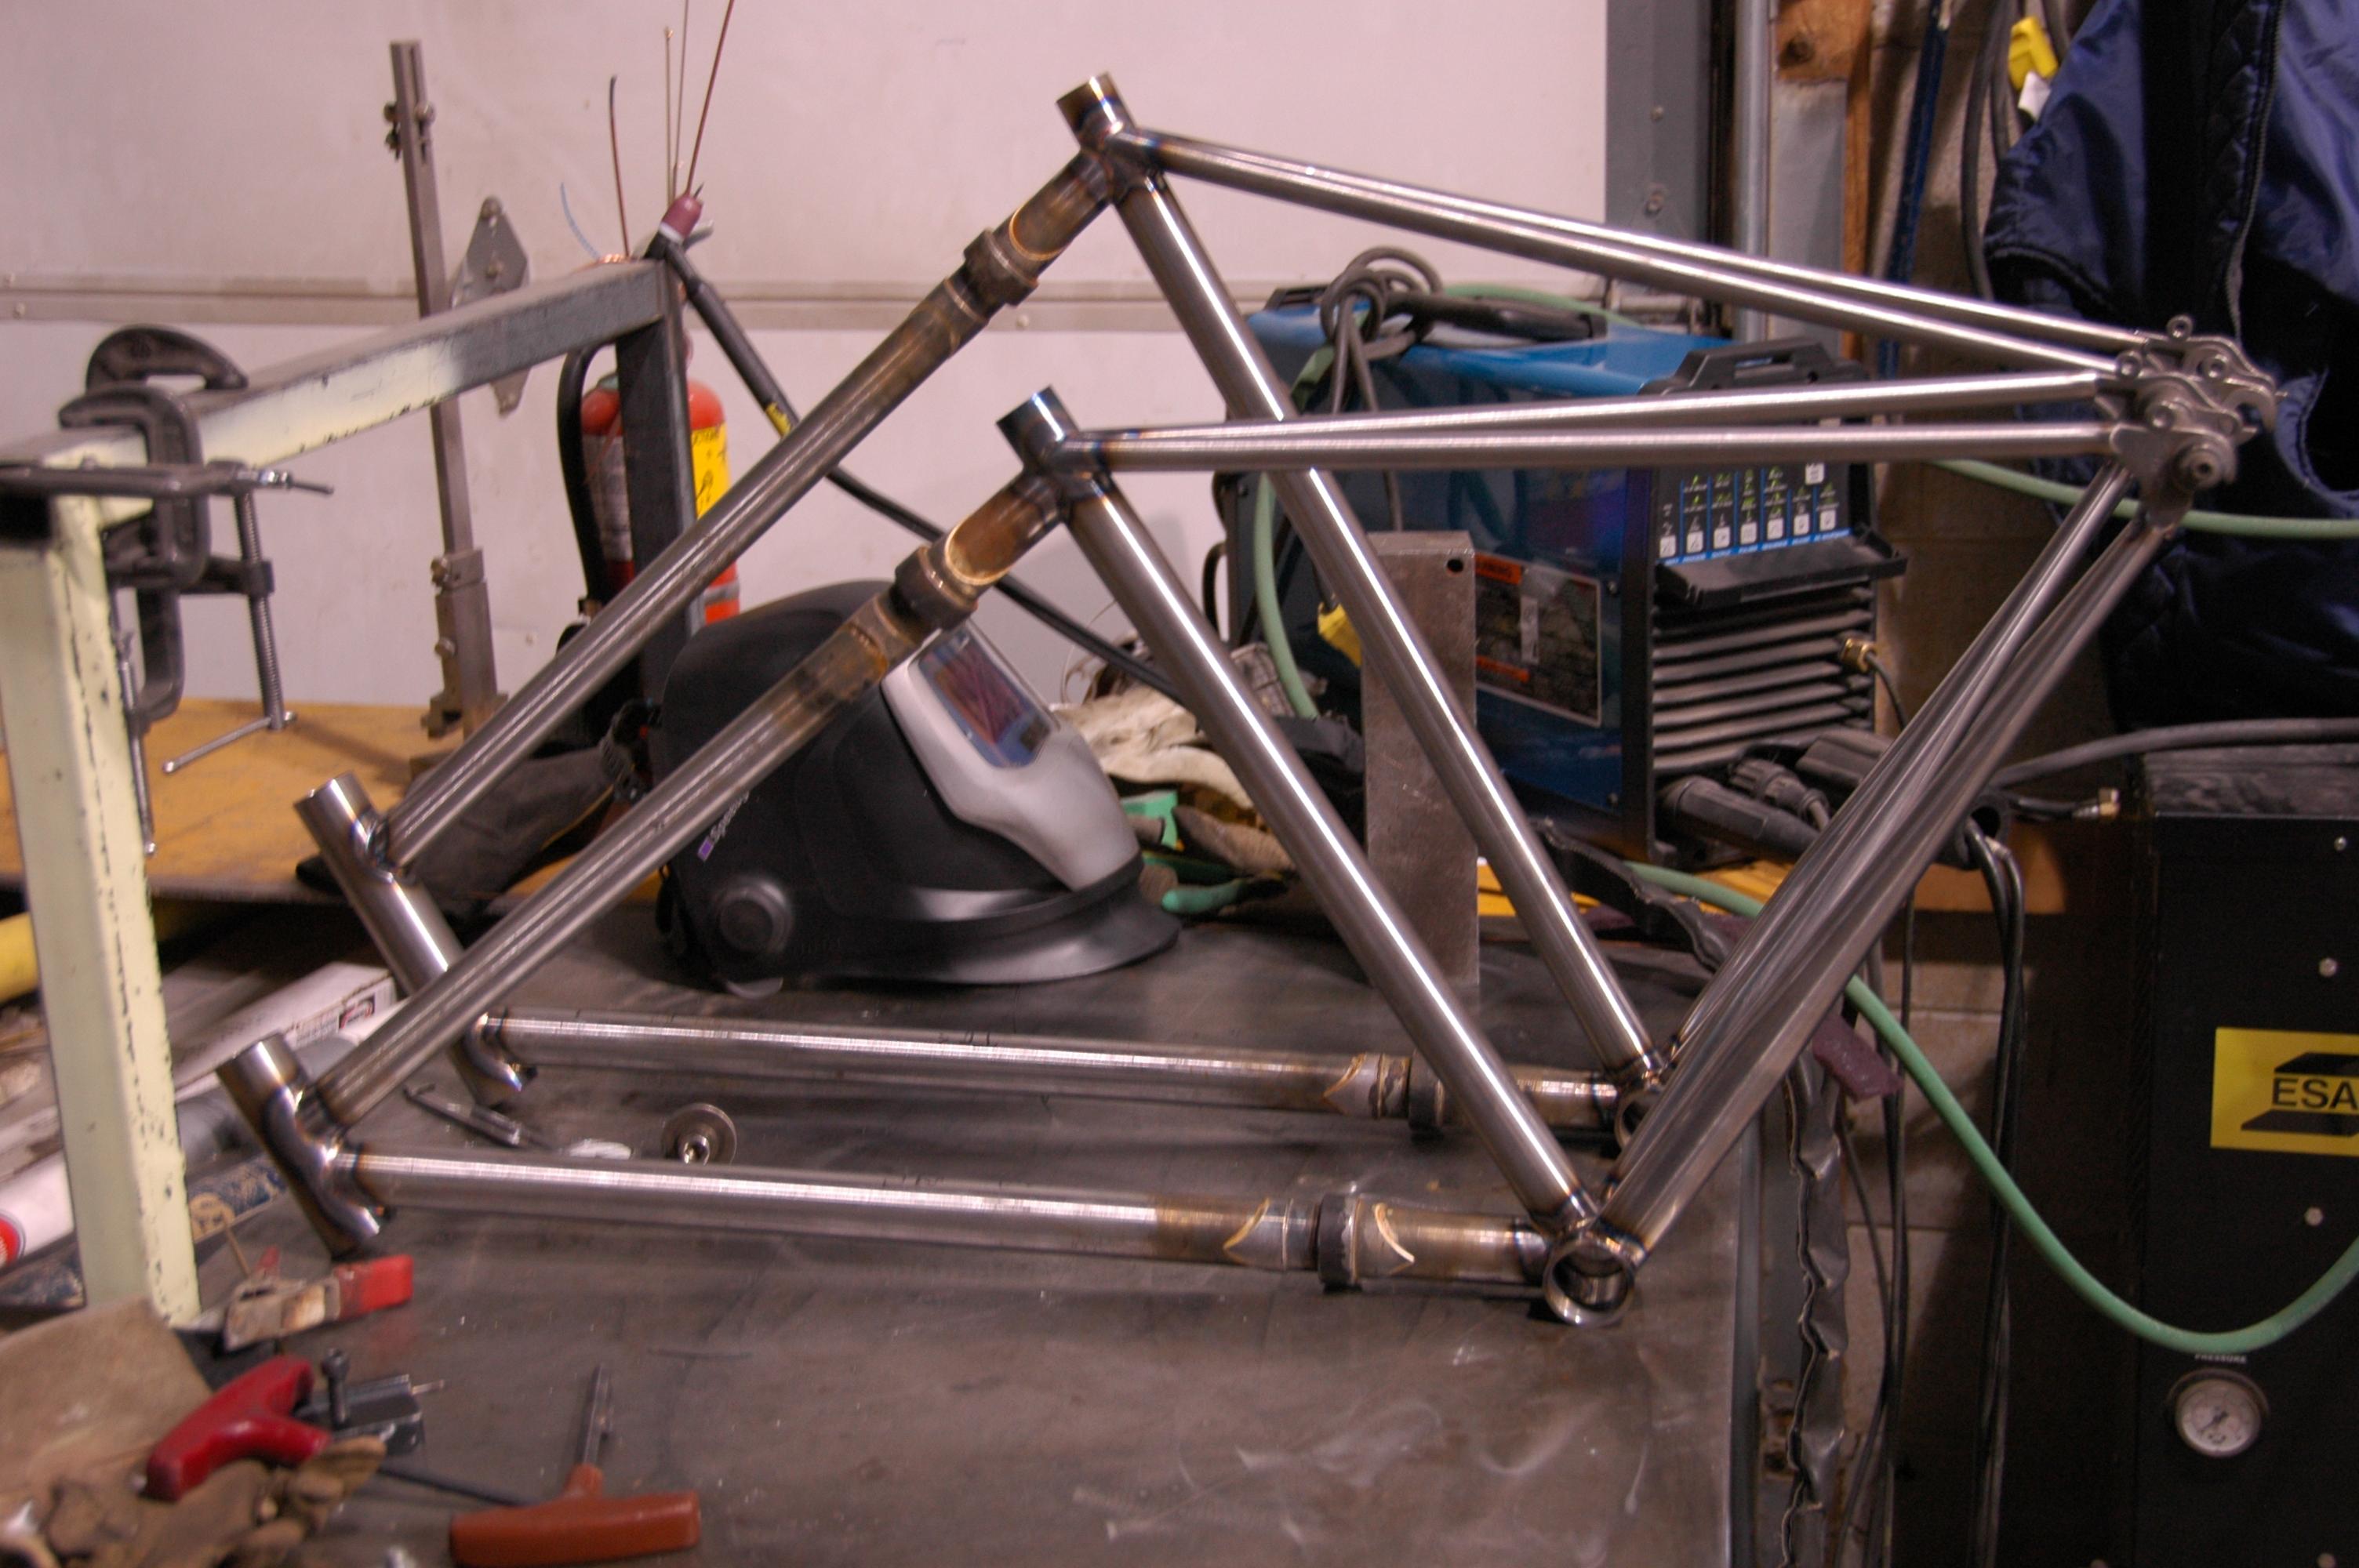 Farwell coupler bikes